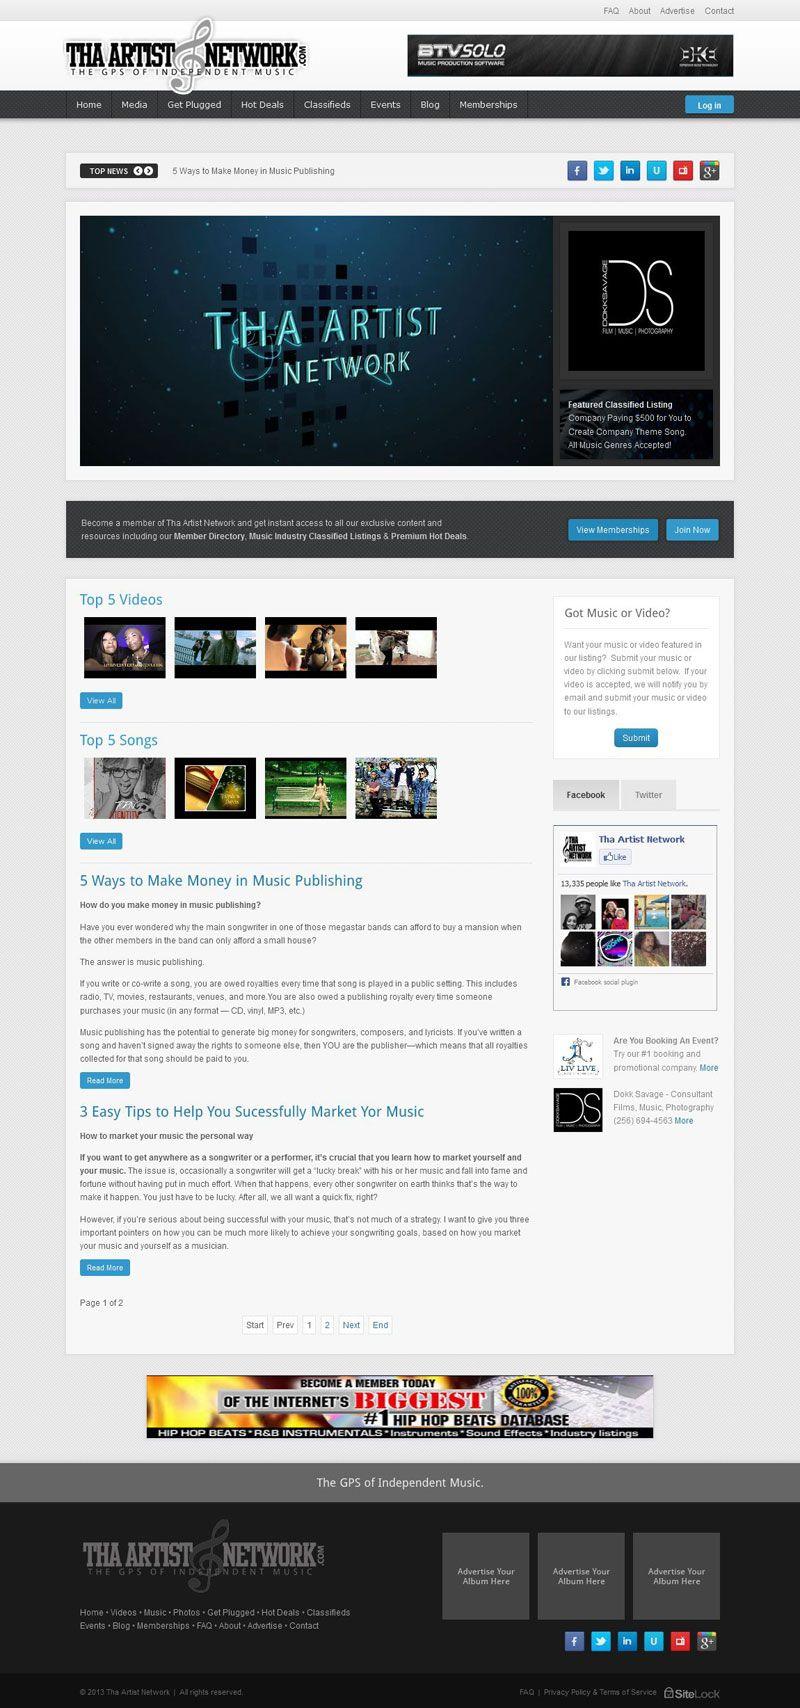 Tha Artist Network Music Industry Social Networking Site Custom Magazine Style Joomla Web Template Theme For T Social Networking Sites Web Design Joomla